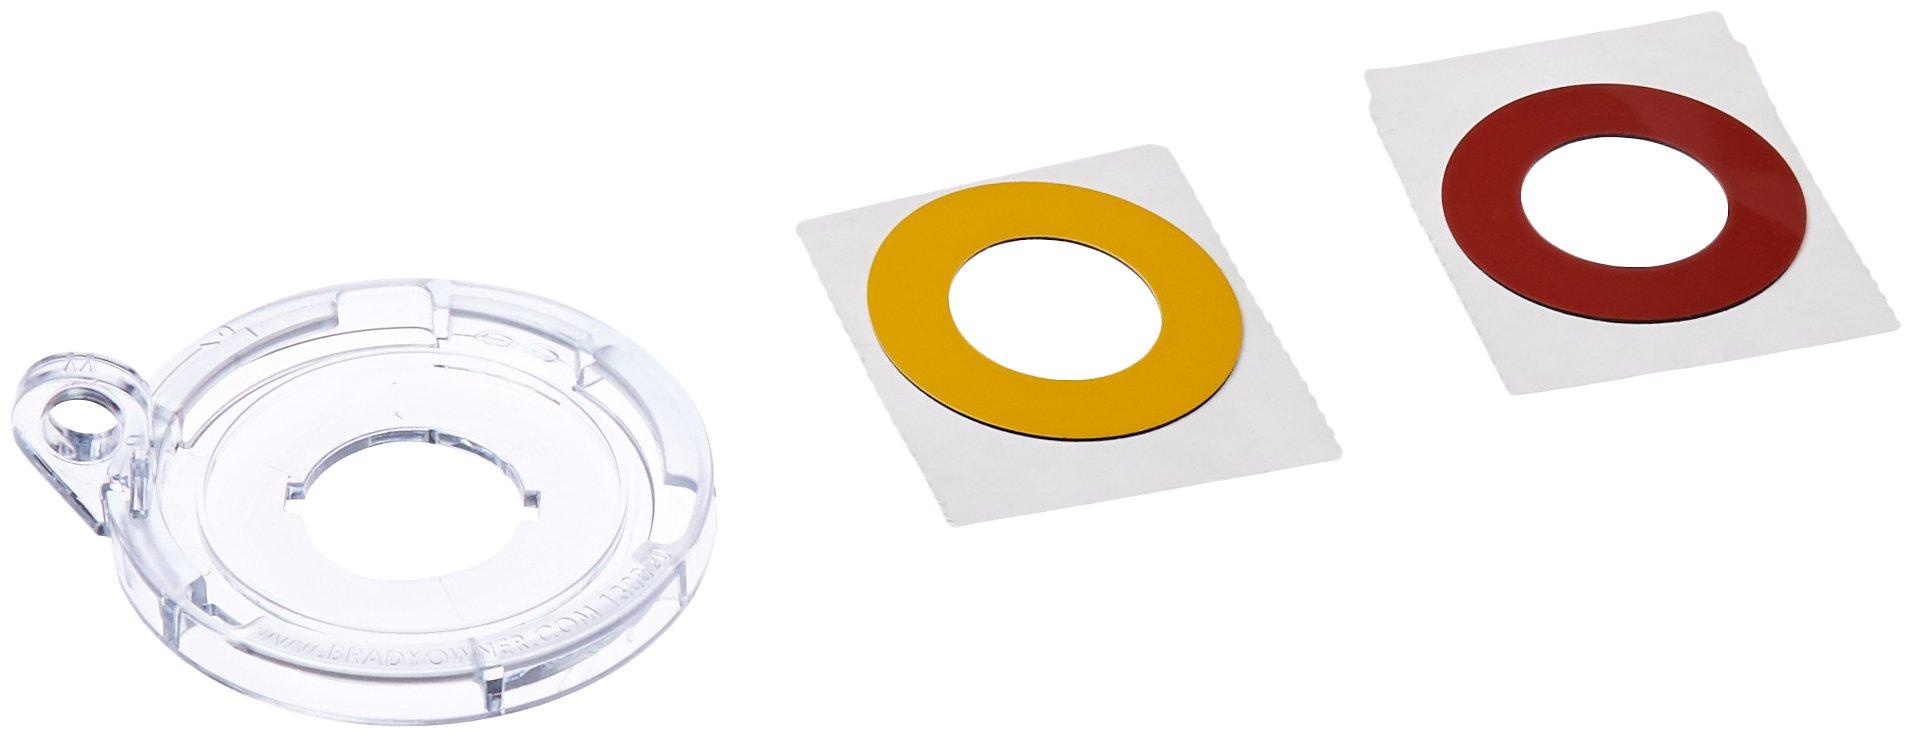 Brady 130823 Push Button Lockout Base, Plastic, 22 mm